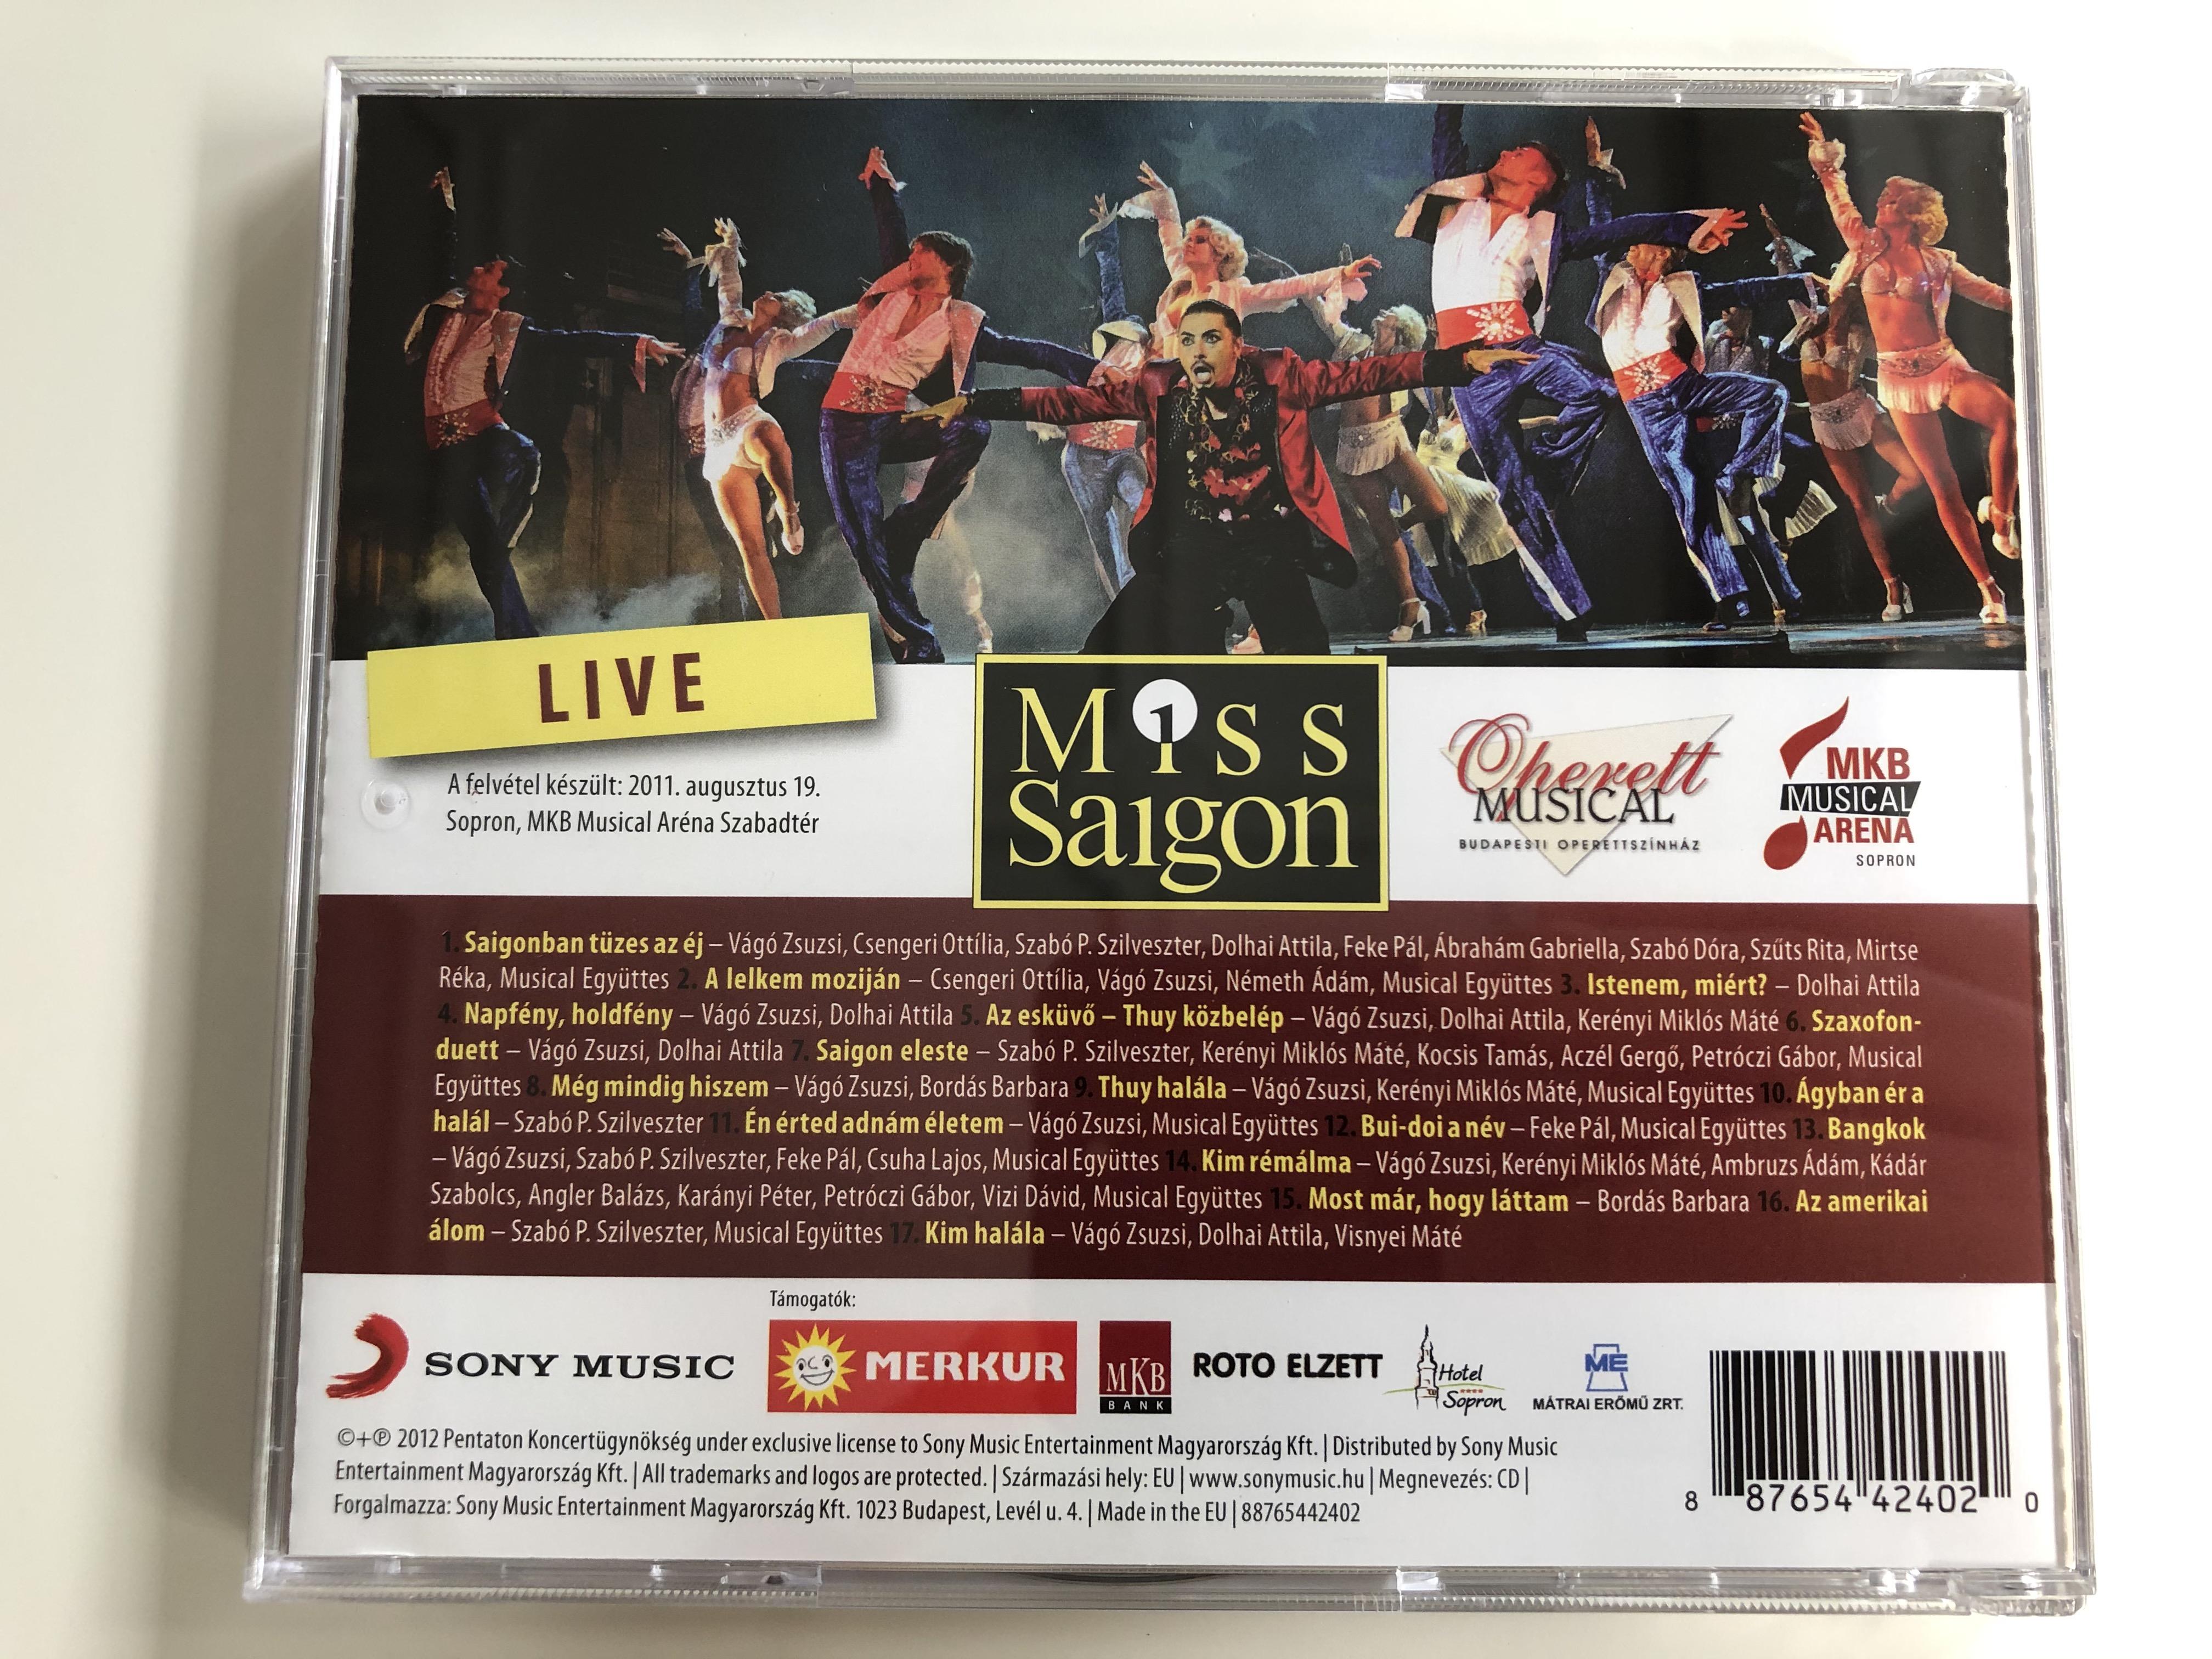 budapest-operettszinhaz-mkb-musical-arena-miss-saigon-musical-zene-claude-michael-schonberg-dalszoveg-richard-maltby-jr.-es-alain-boubil-sony-music-entertainment-audio-cd-2012-887654424020-8-.jpg